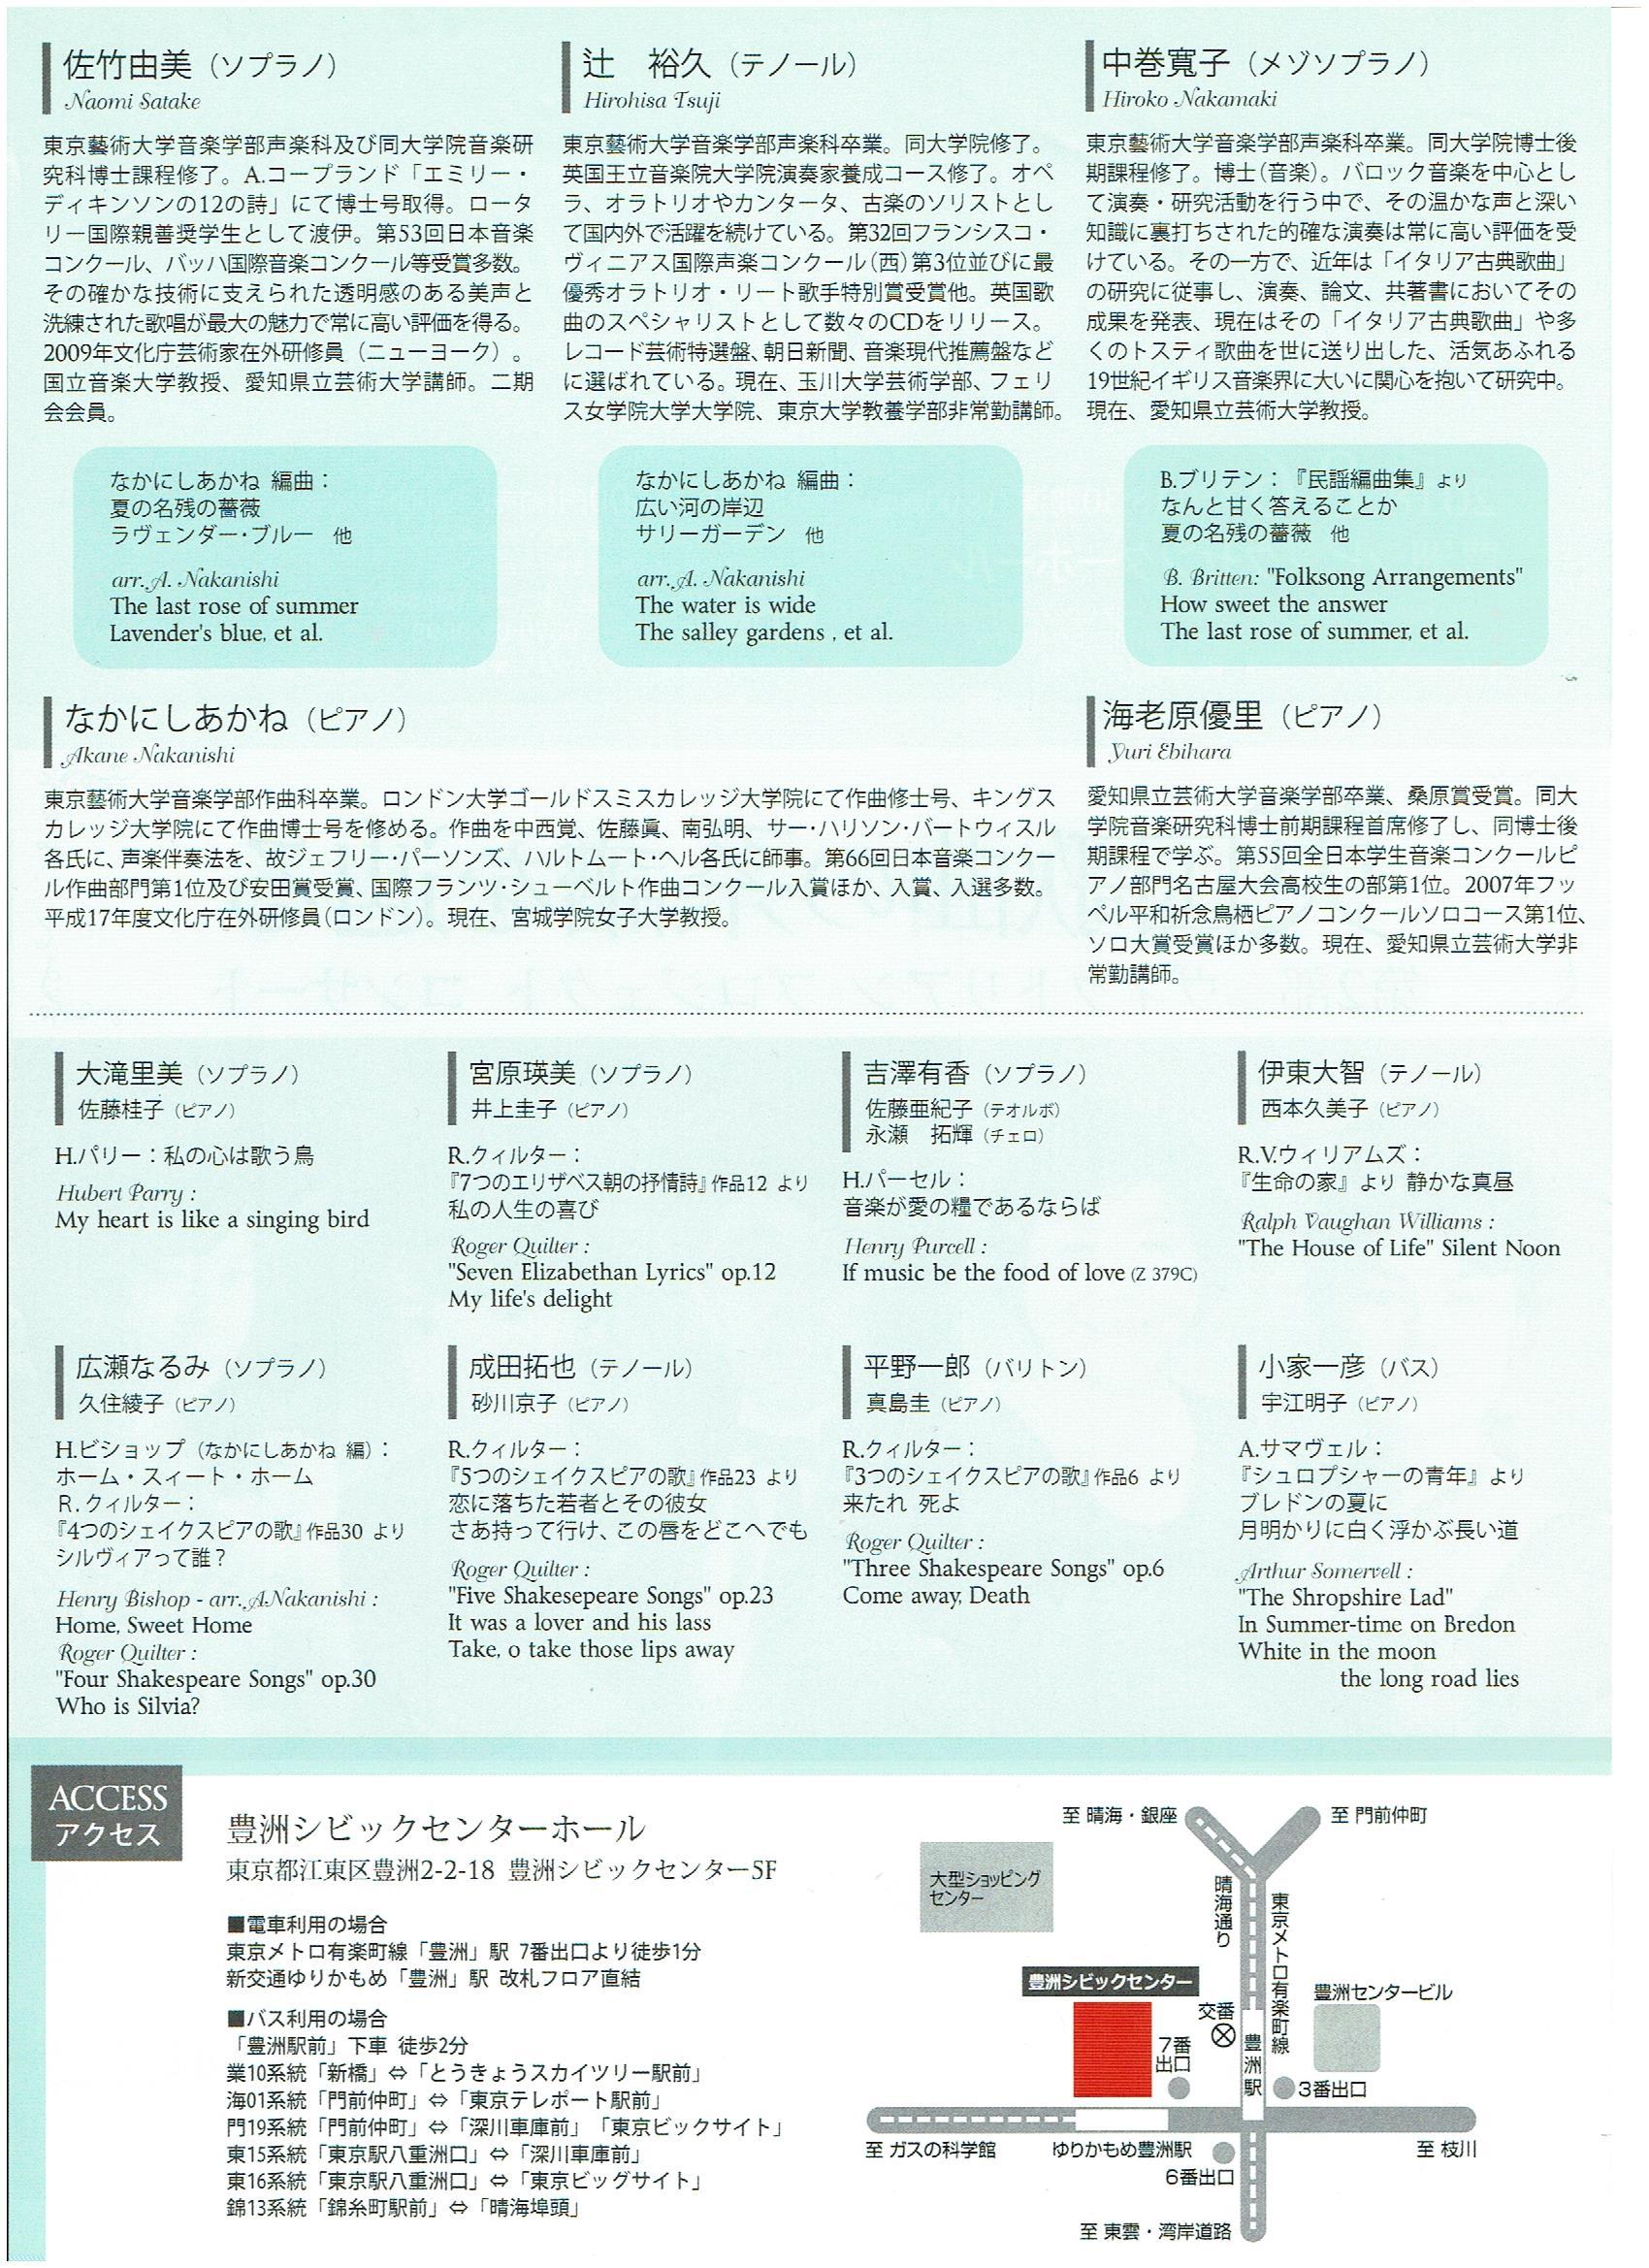 Sound International Japan